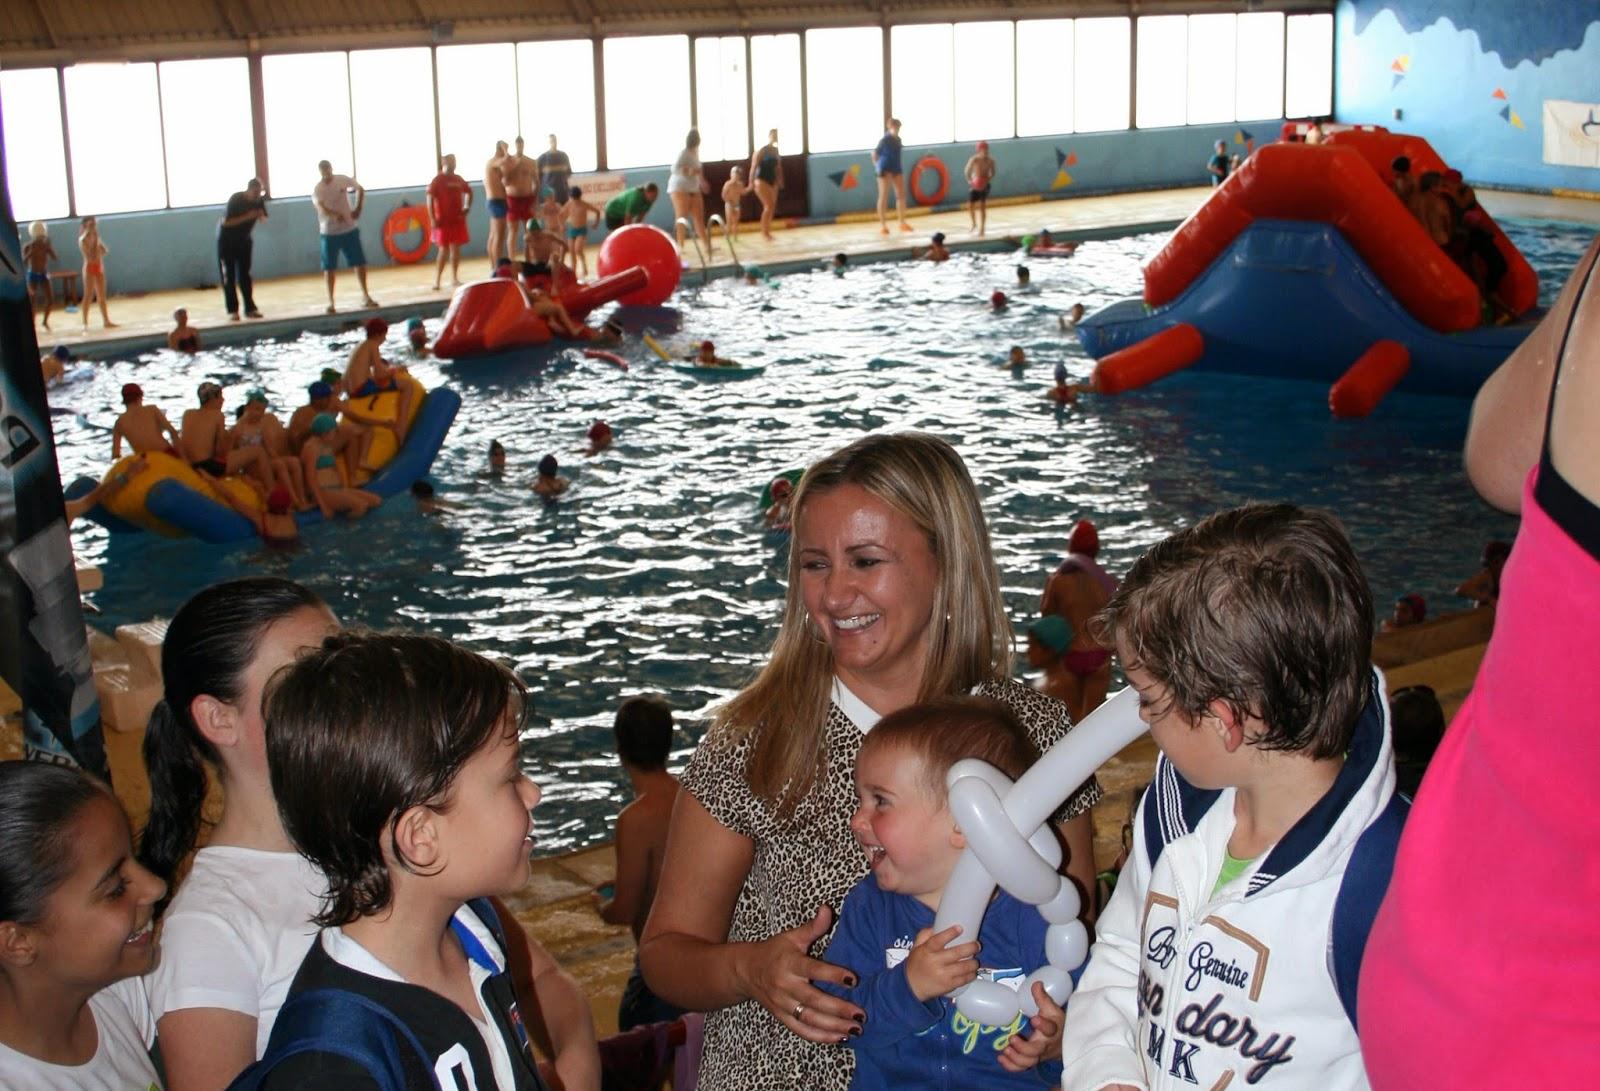 Nueva edici n del d a del agua en familia en toledo for Piscina cubierta illescas